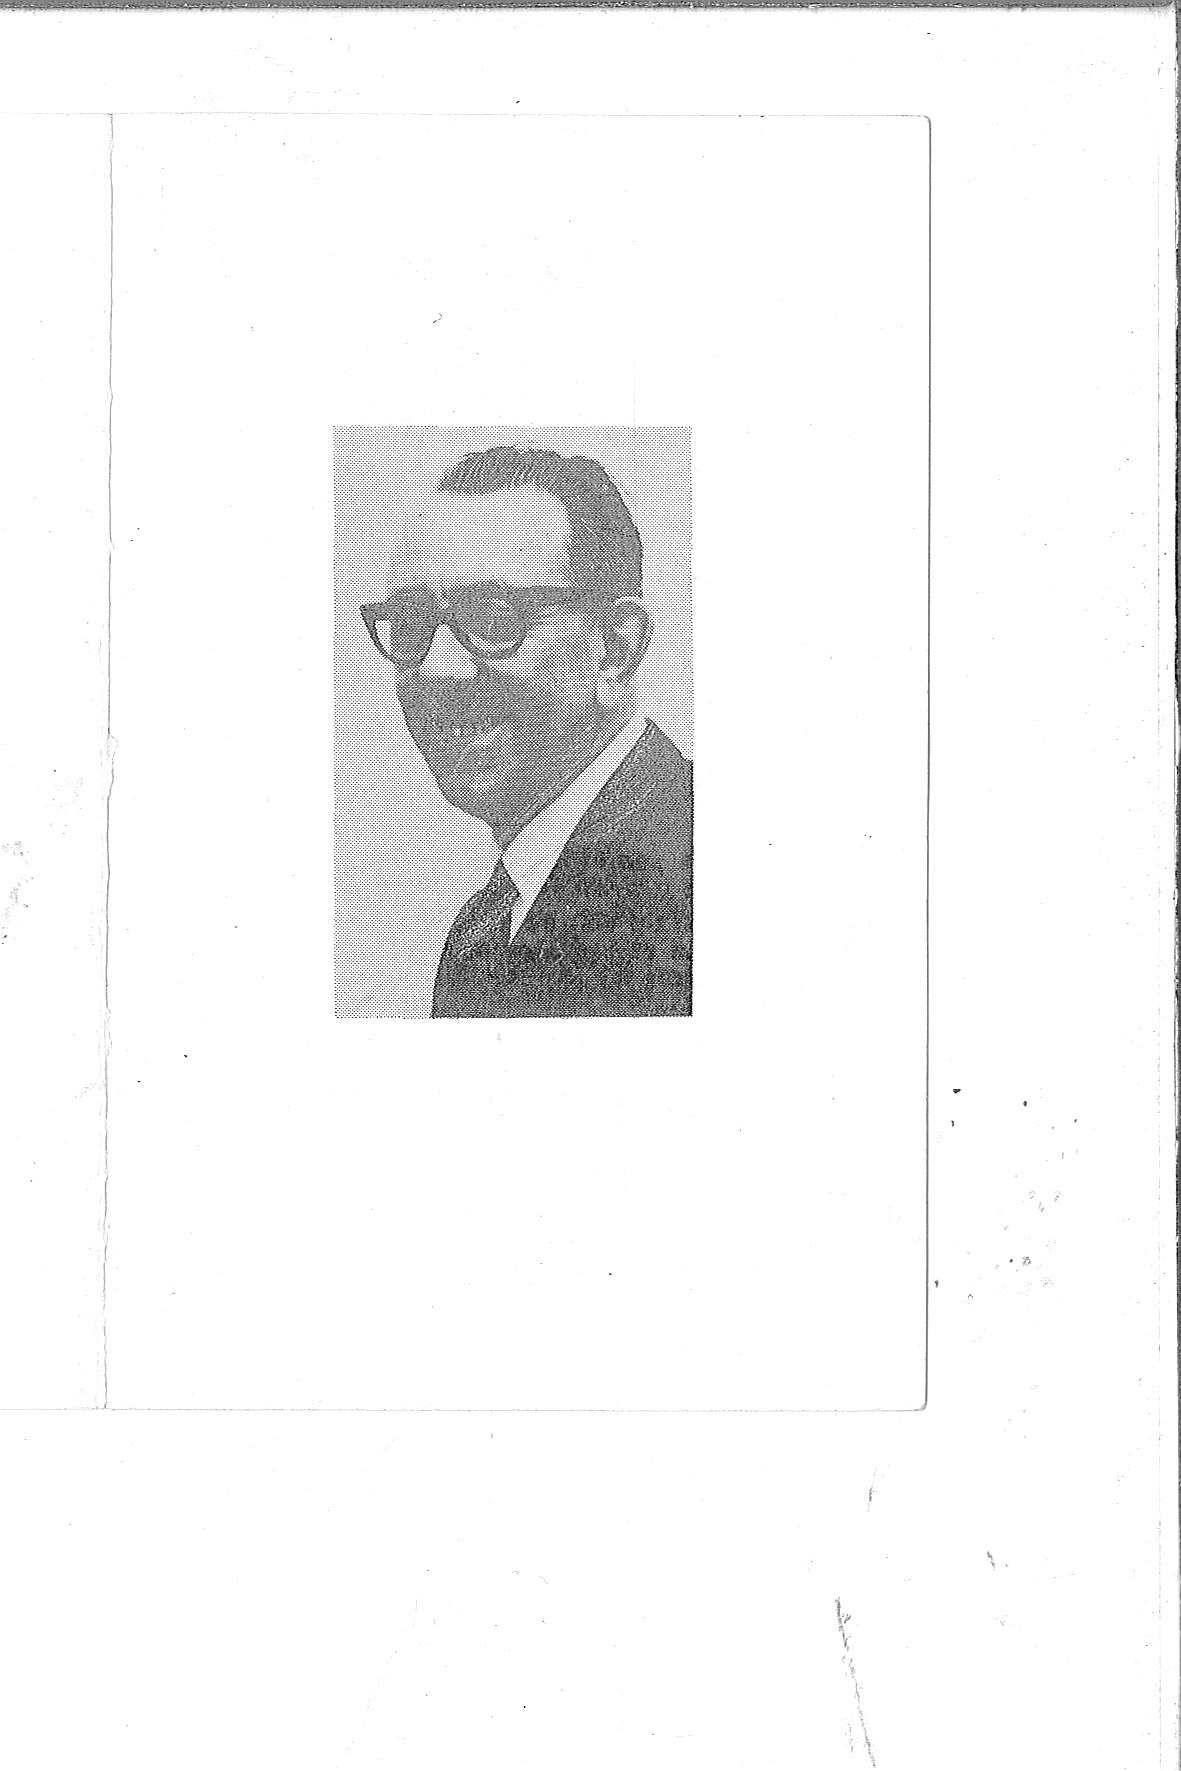 Edmond-Henri-Gustave(1981)20131029155753_00007.jpg